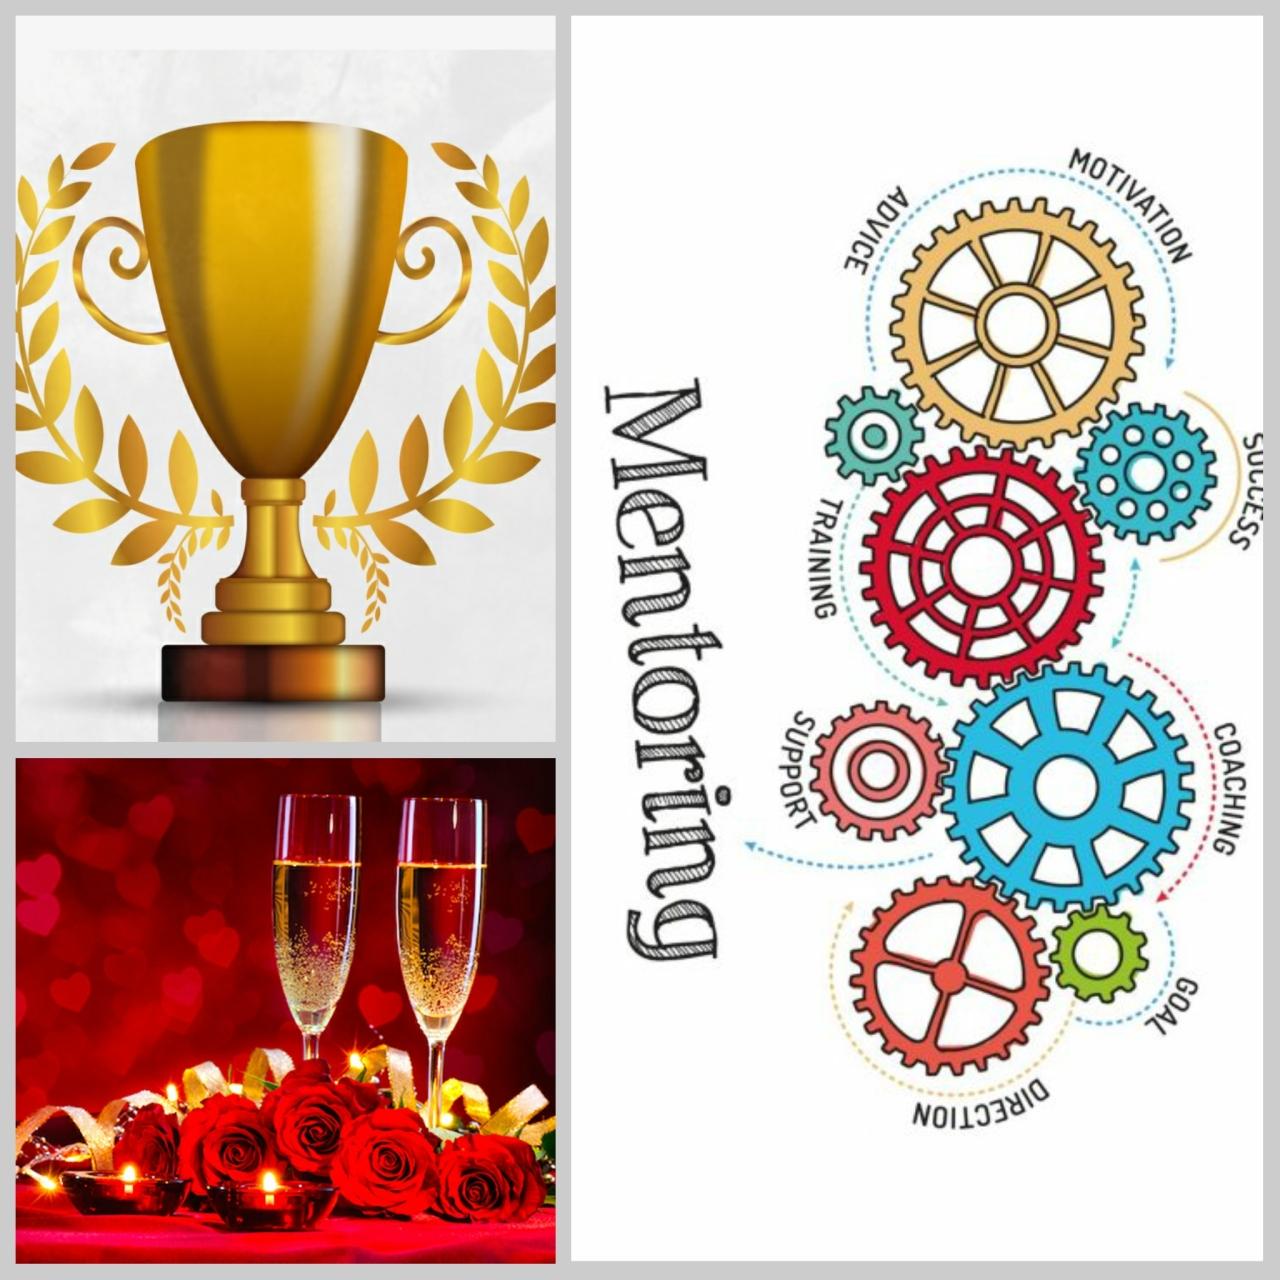 Celebrations – Mentoring &Accolades